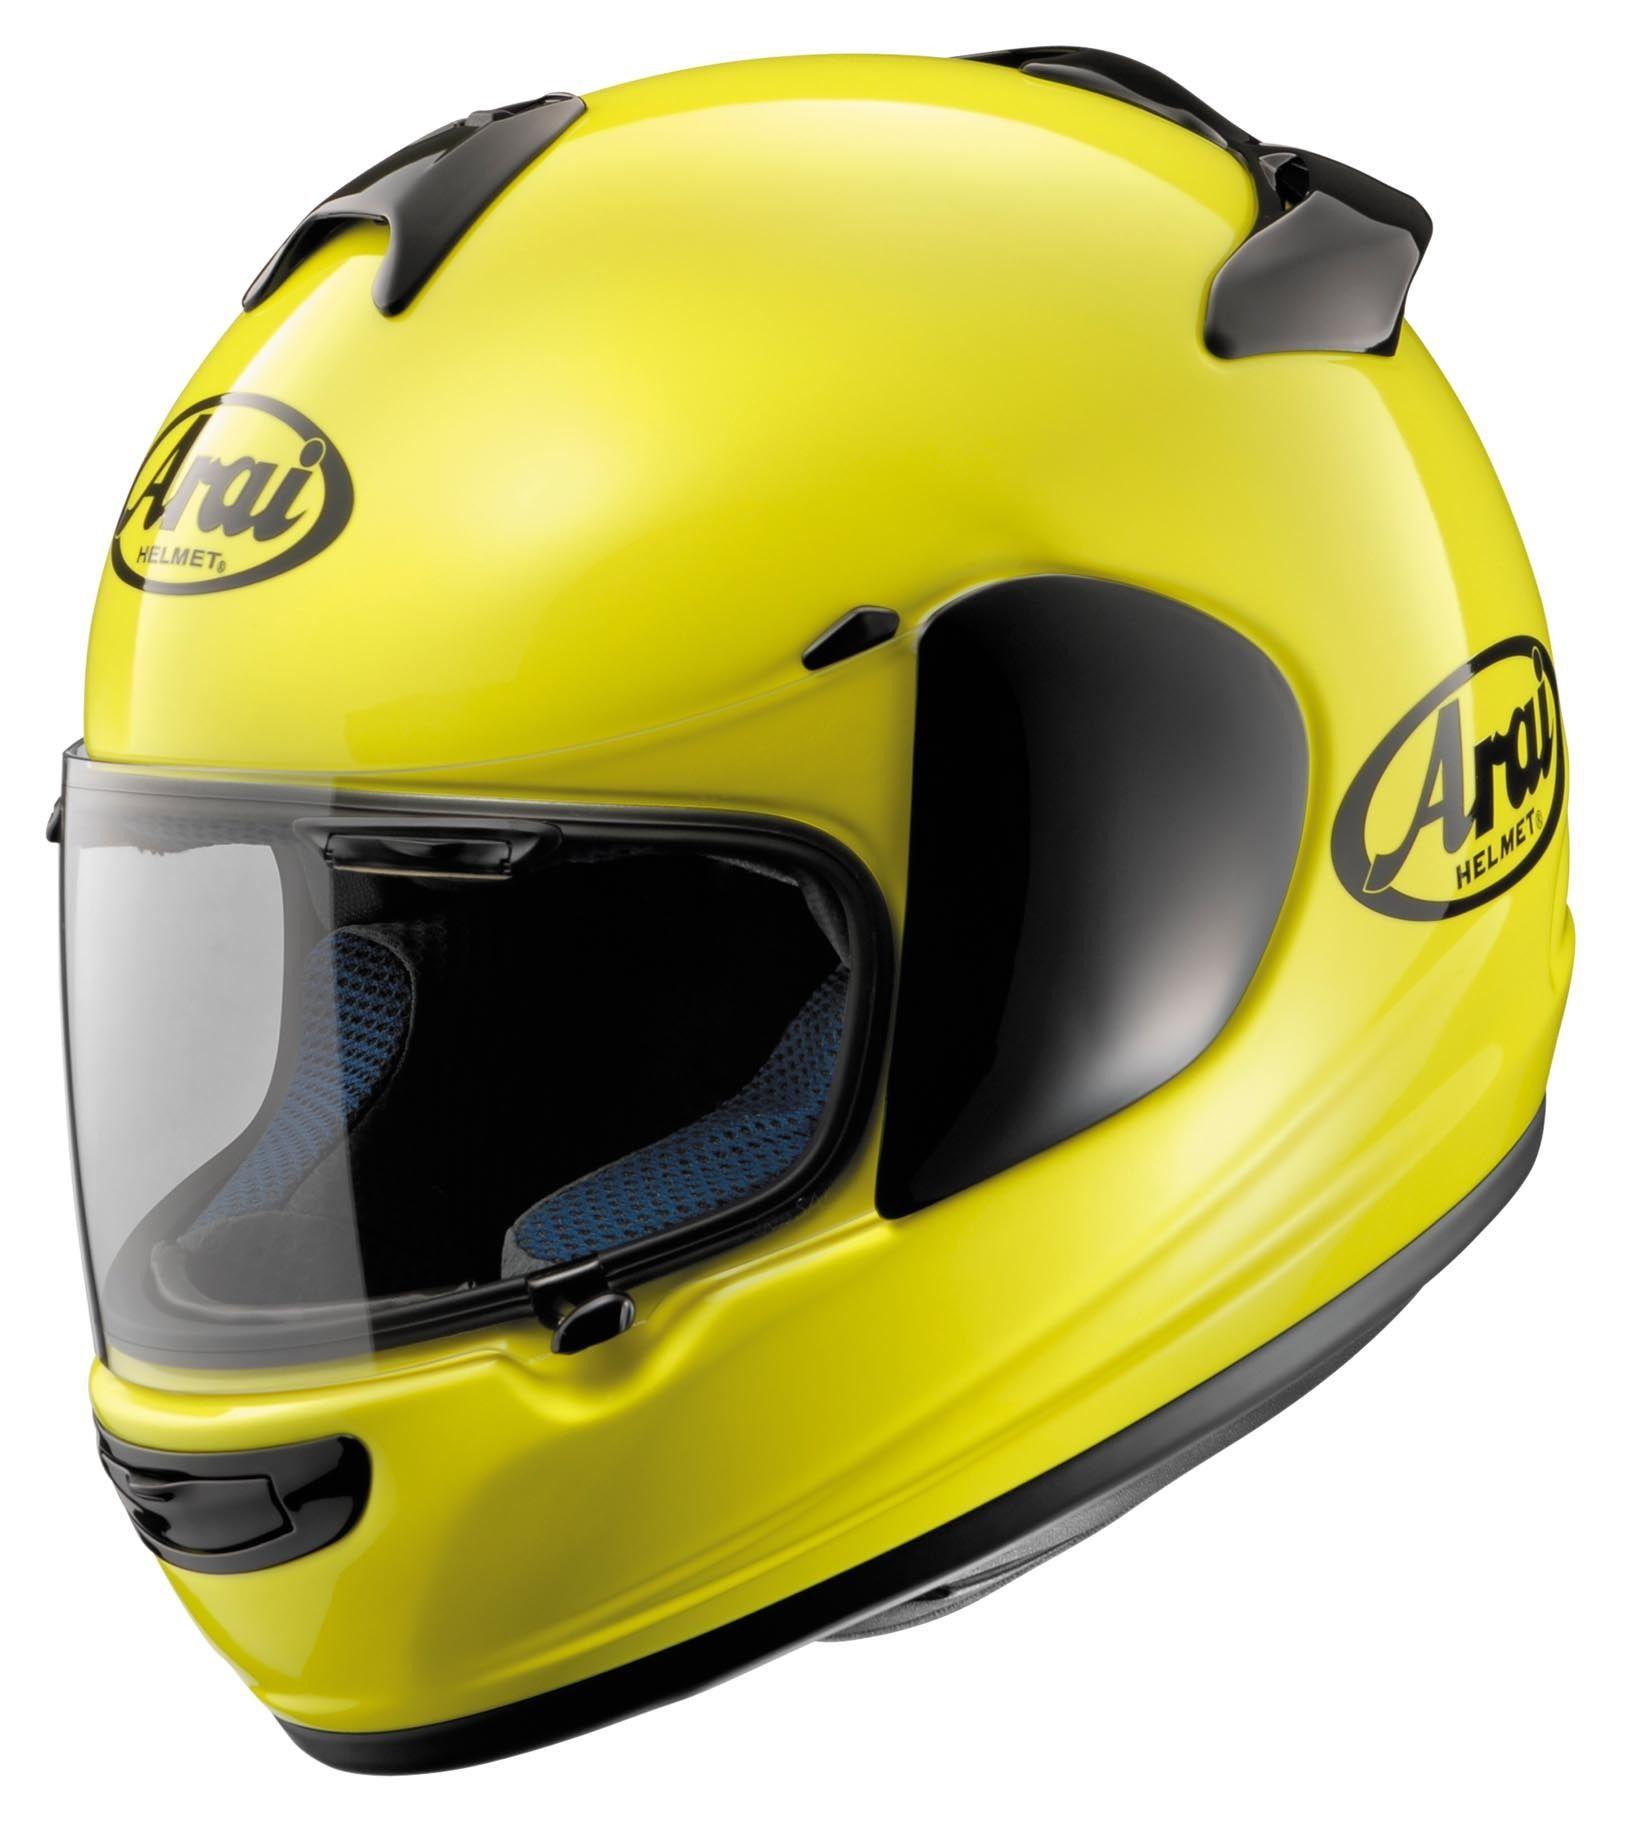 Ducati Motorcycle Helmets For Sale